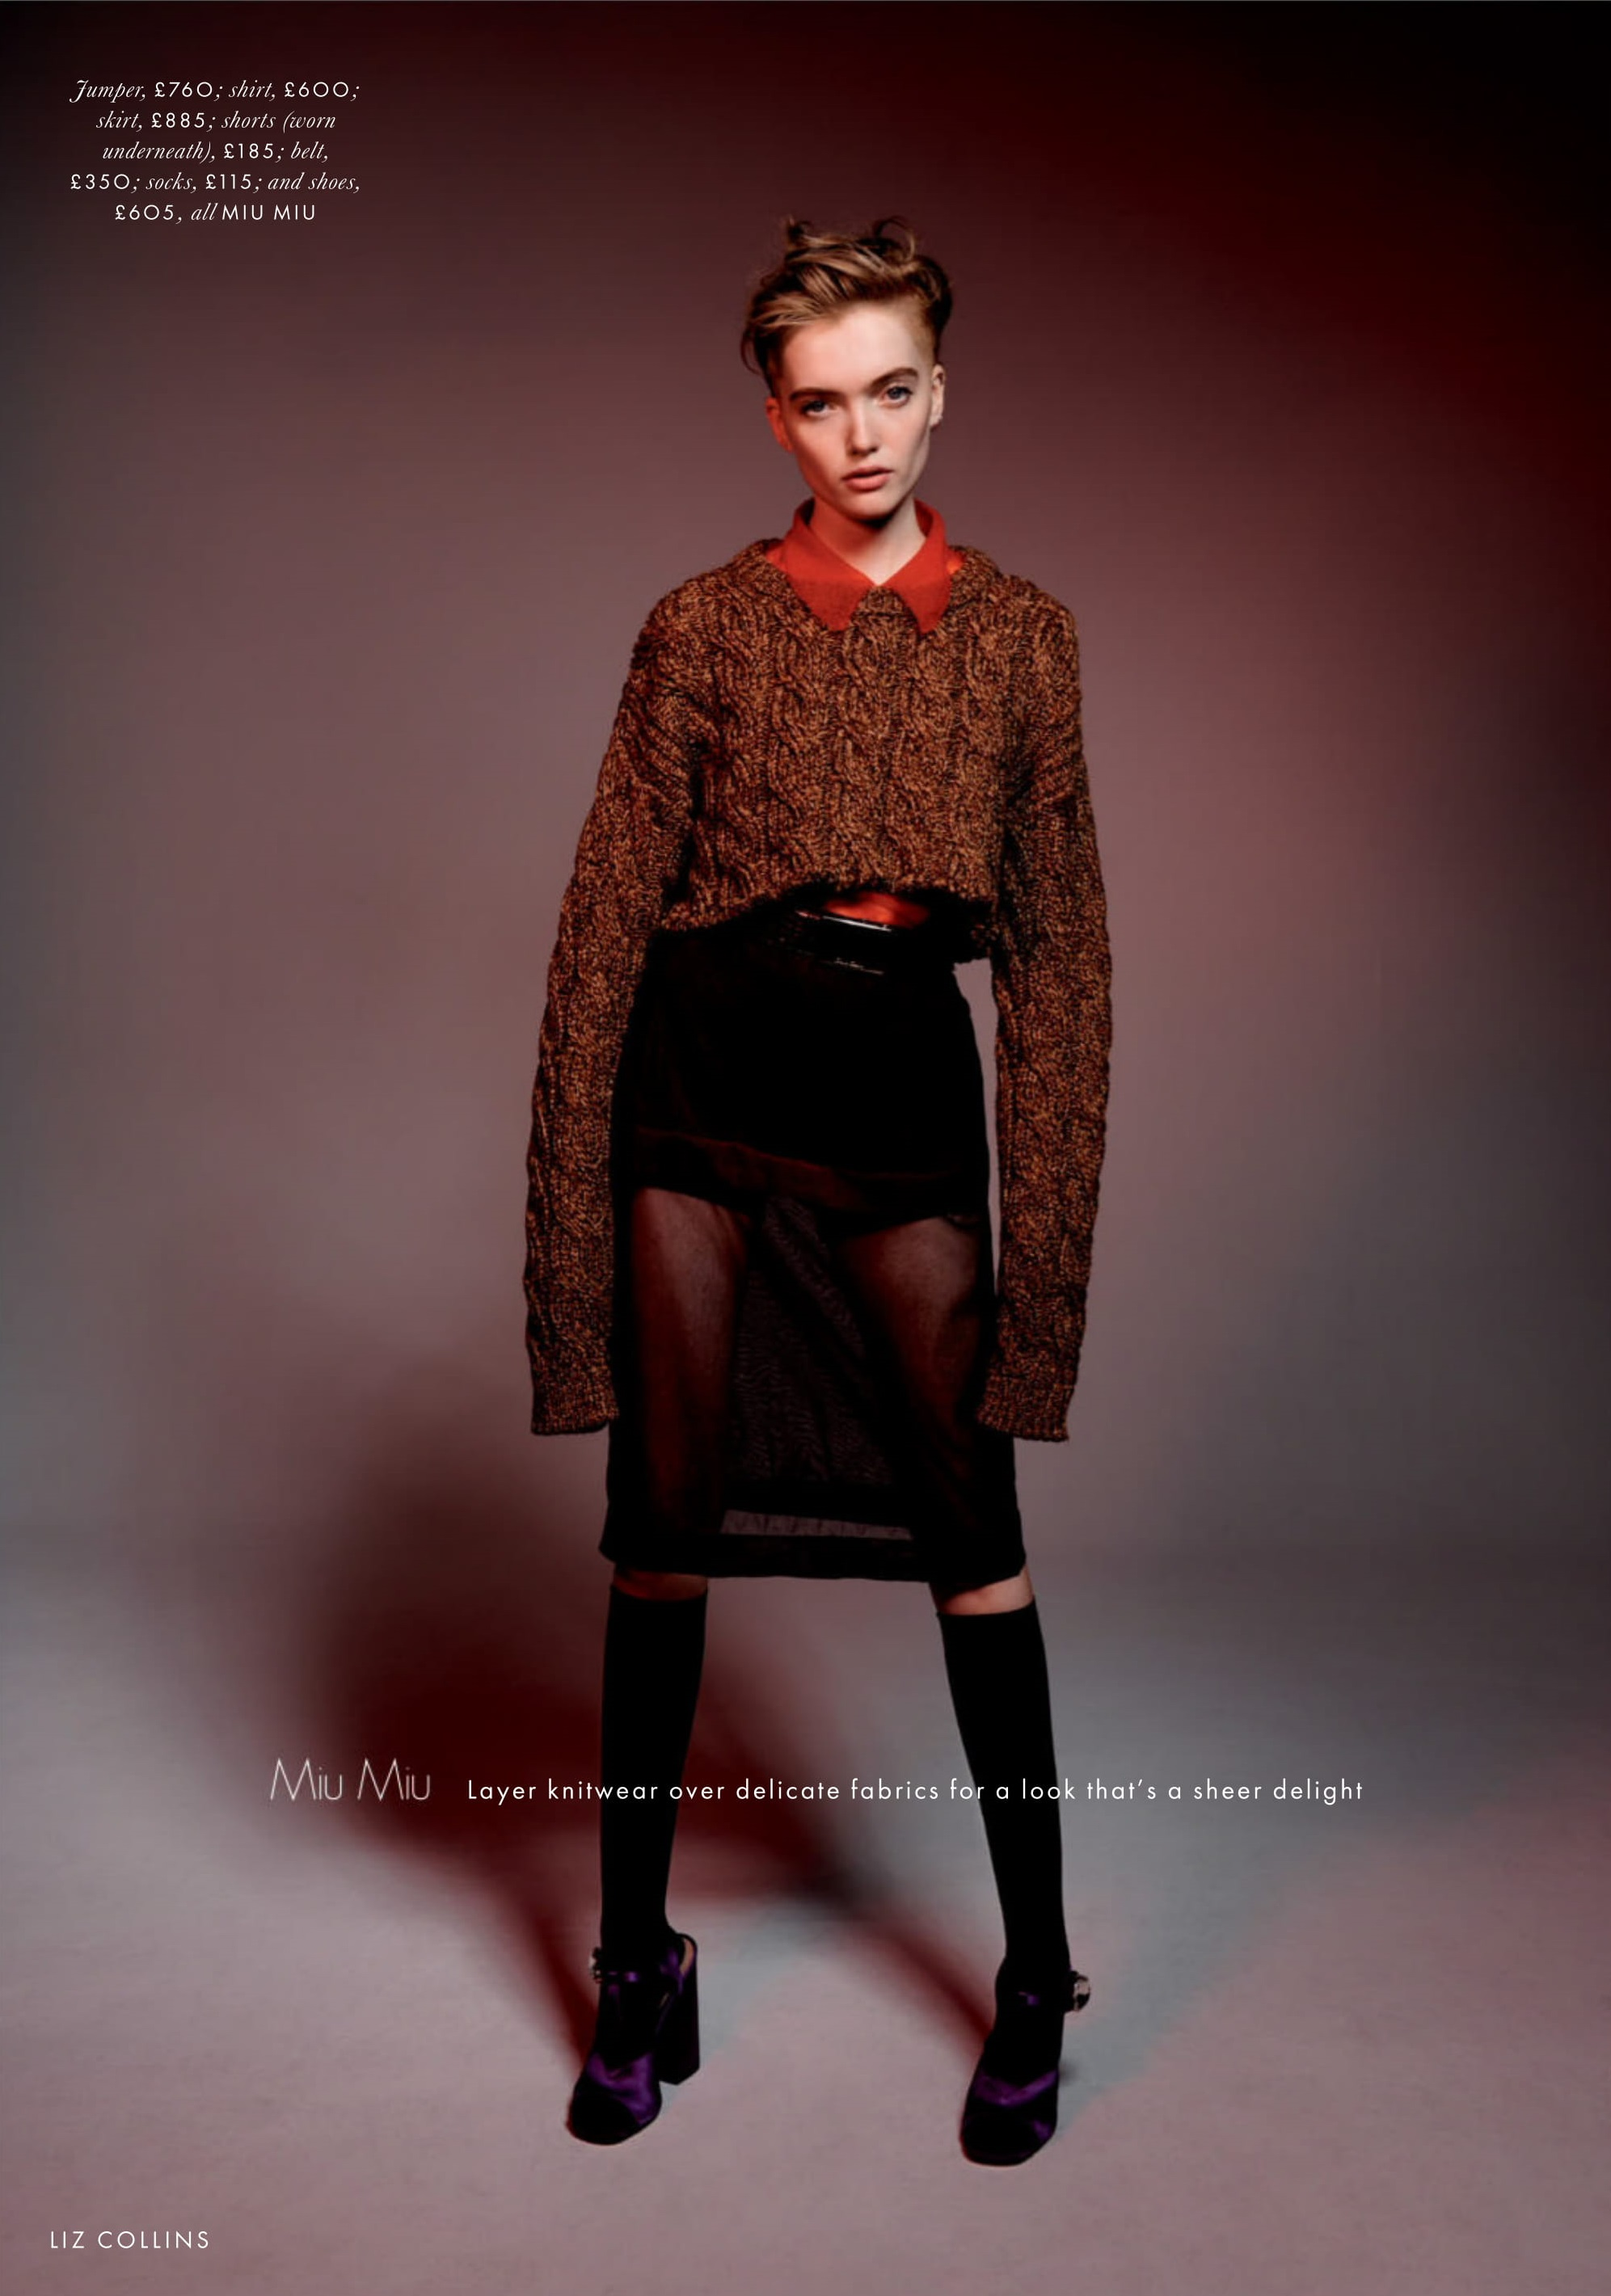 Ruth Bell Vogue UK Feb 2019 London Look (3).jpg